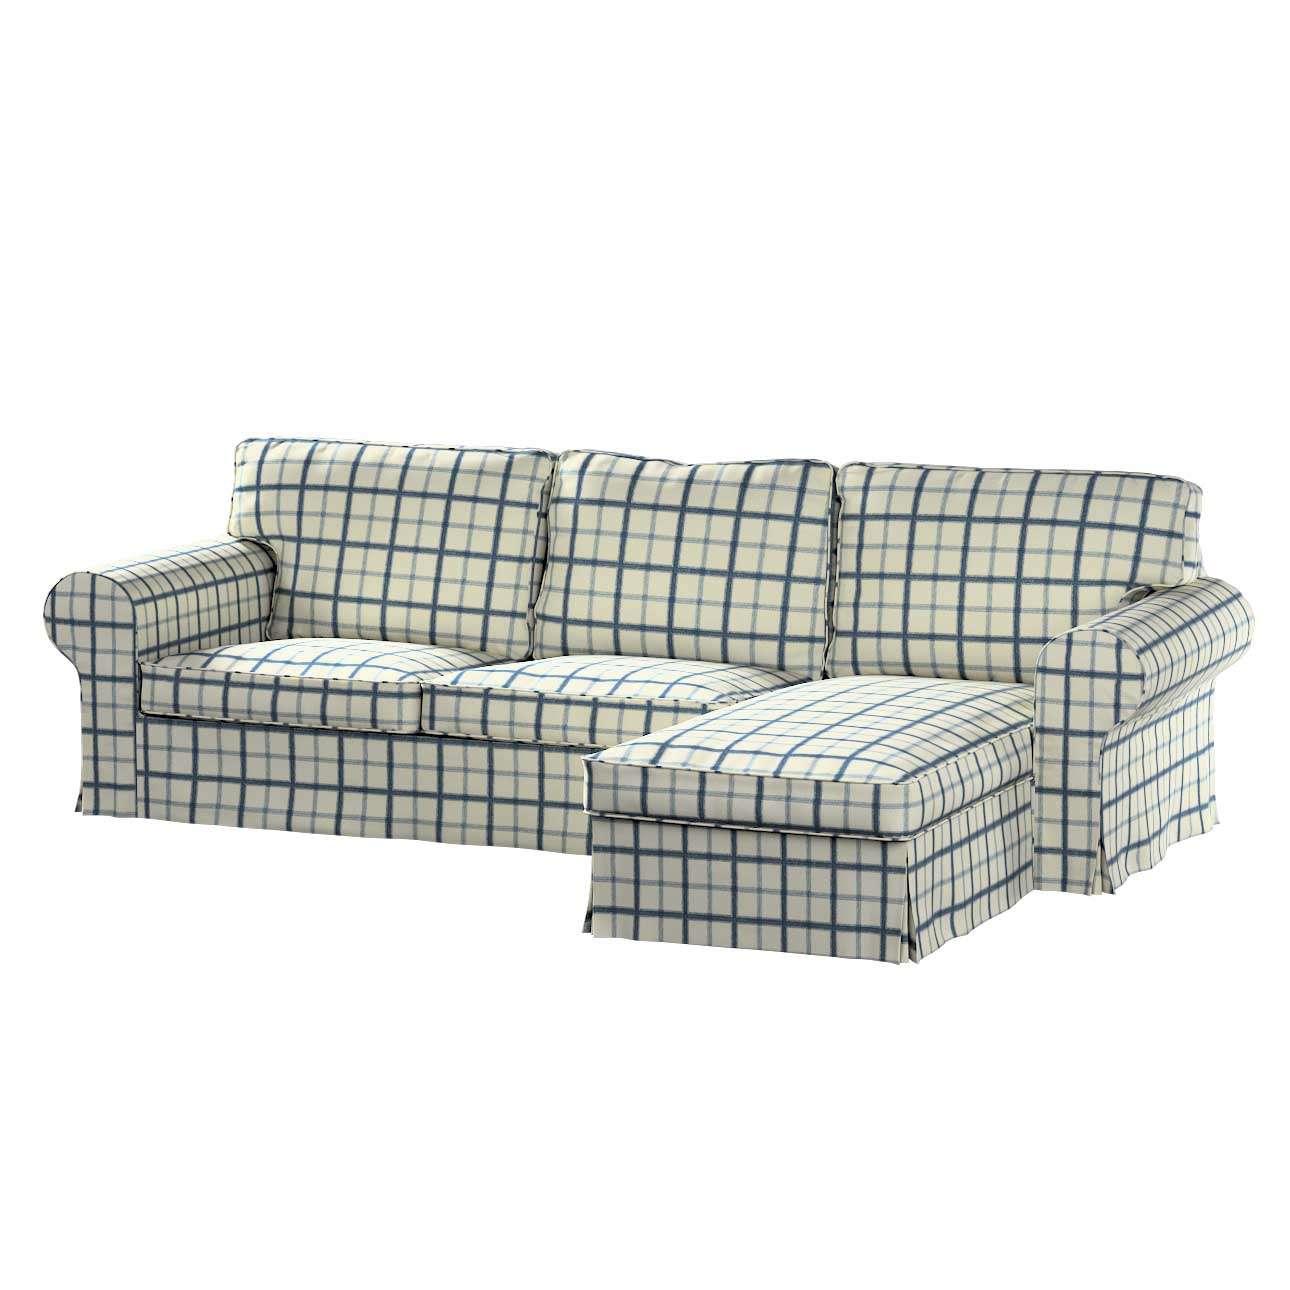 Ektorp 2-Sitzer Sofabezug mit Recamiere Ektorp 2-Sitzer Sofabezug mit Recamiere von der Kollektion Avinon, Stoff: 131-66